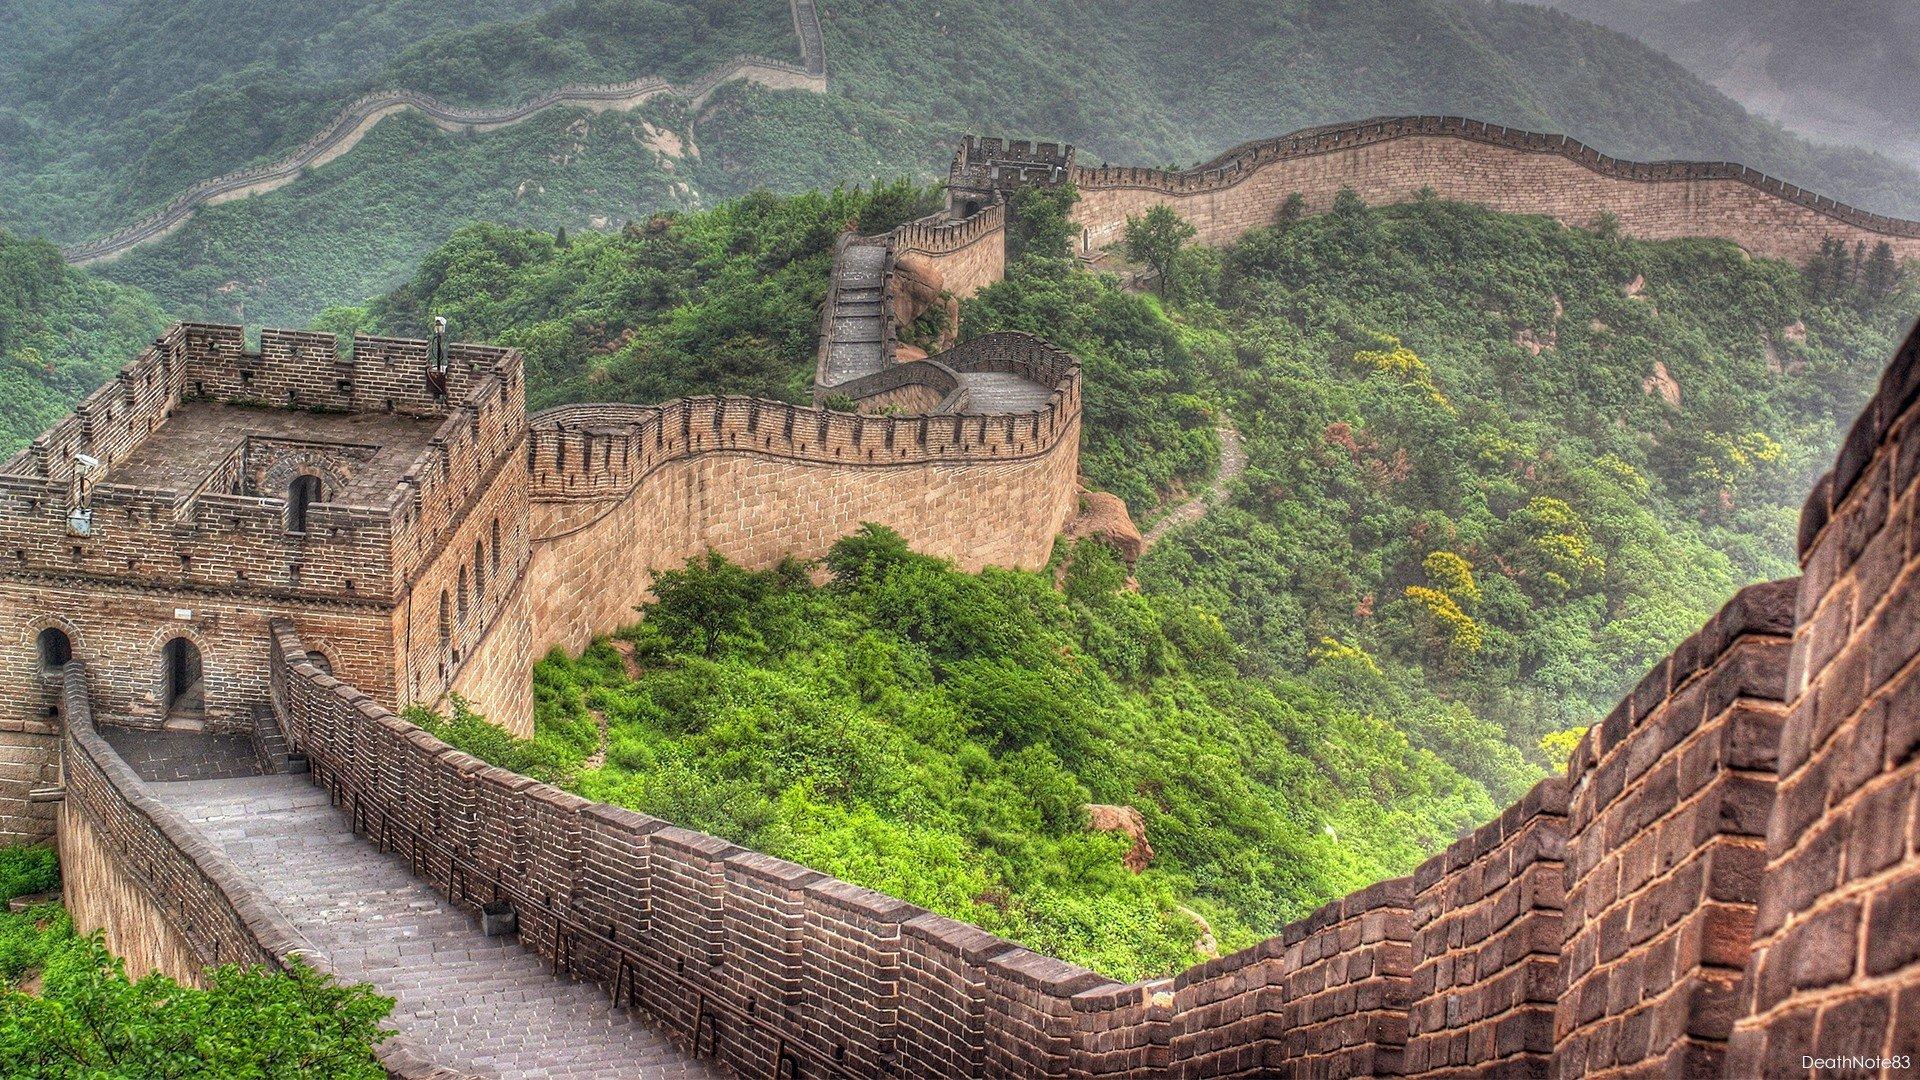 The Great Wall Of China Fondo De Pantalla Hd Fondo De